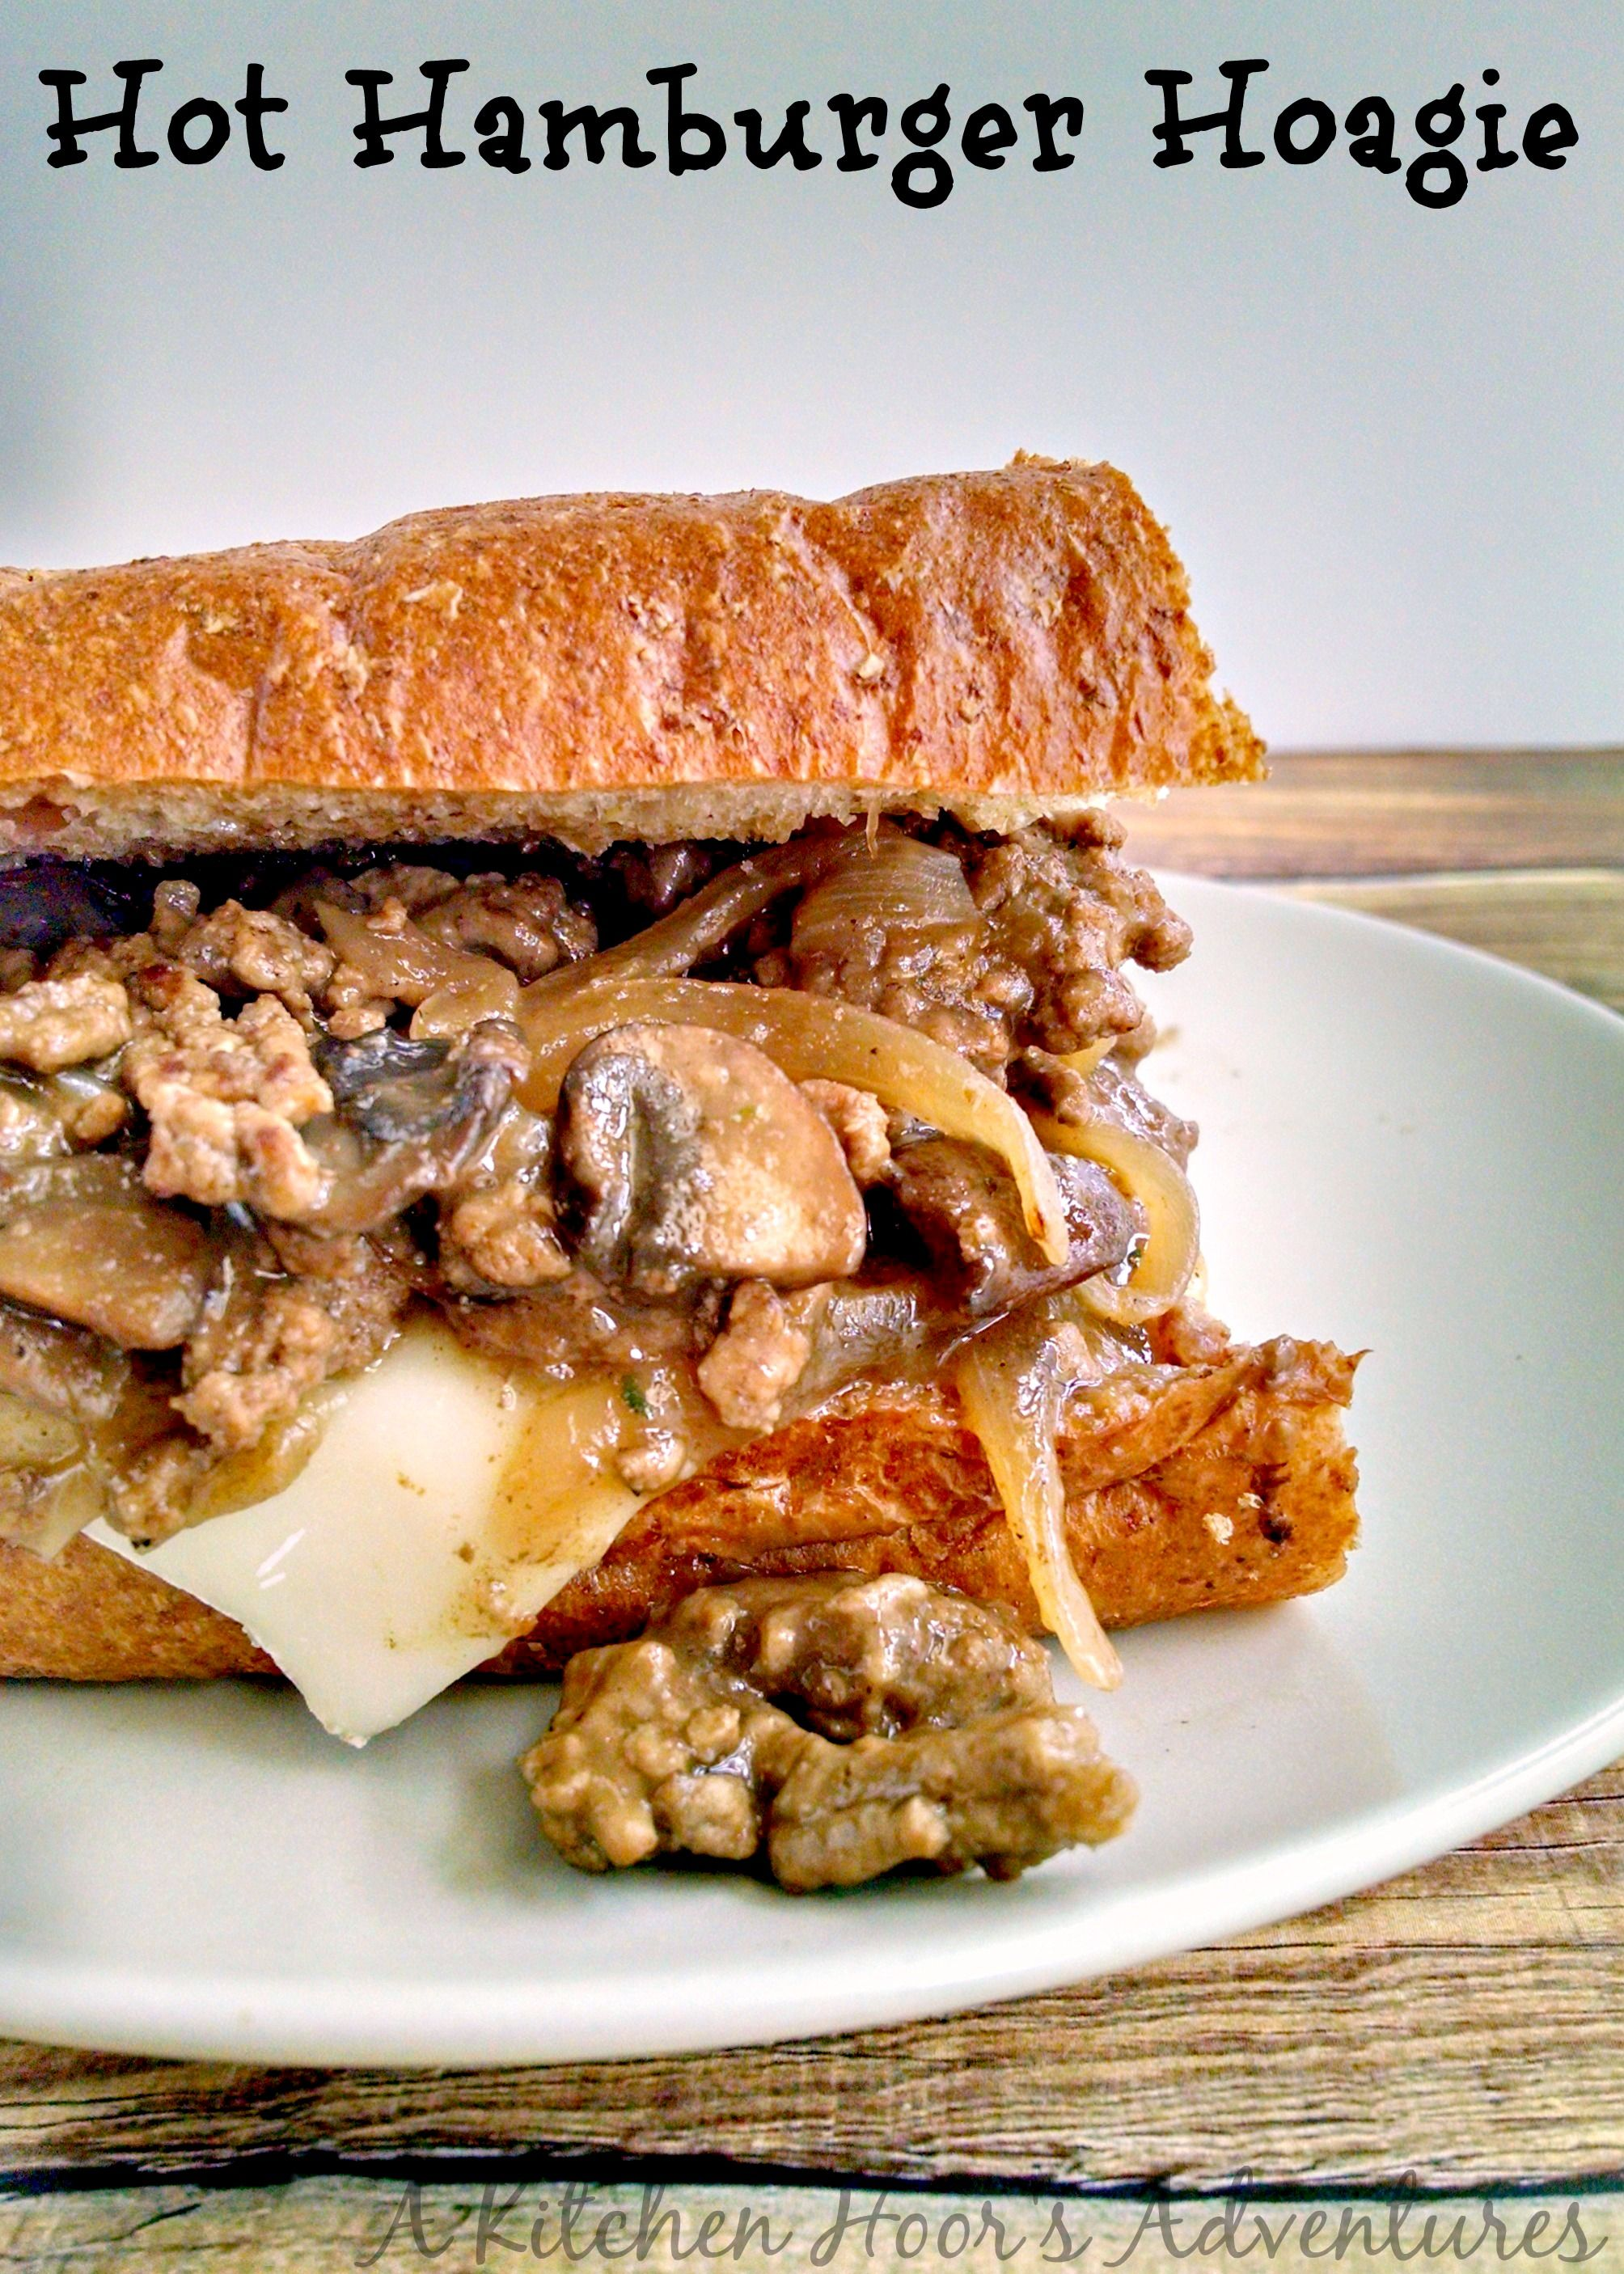 Hot hamburger hoagie receta hamburguesas recetas para - Platos faciles para cocinar ...